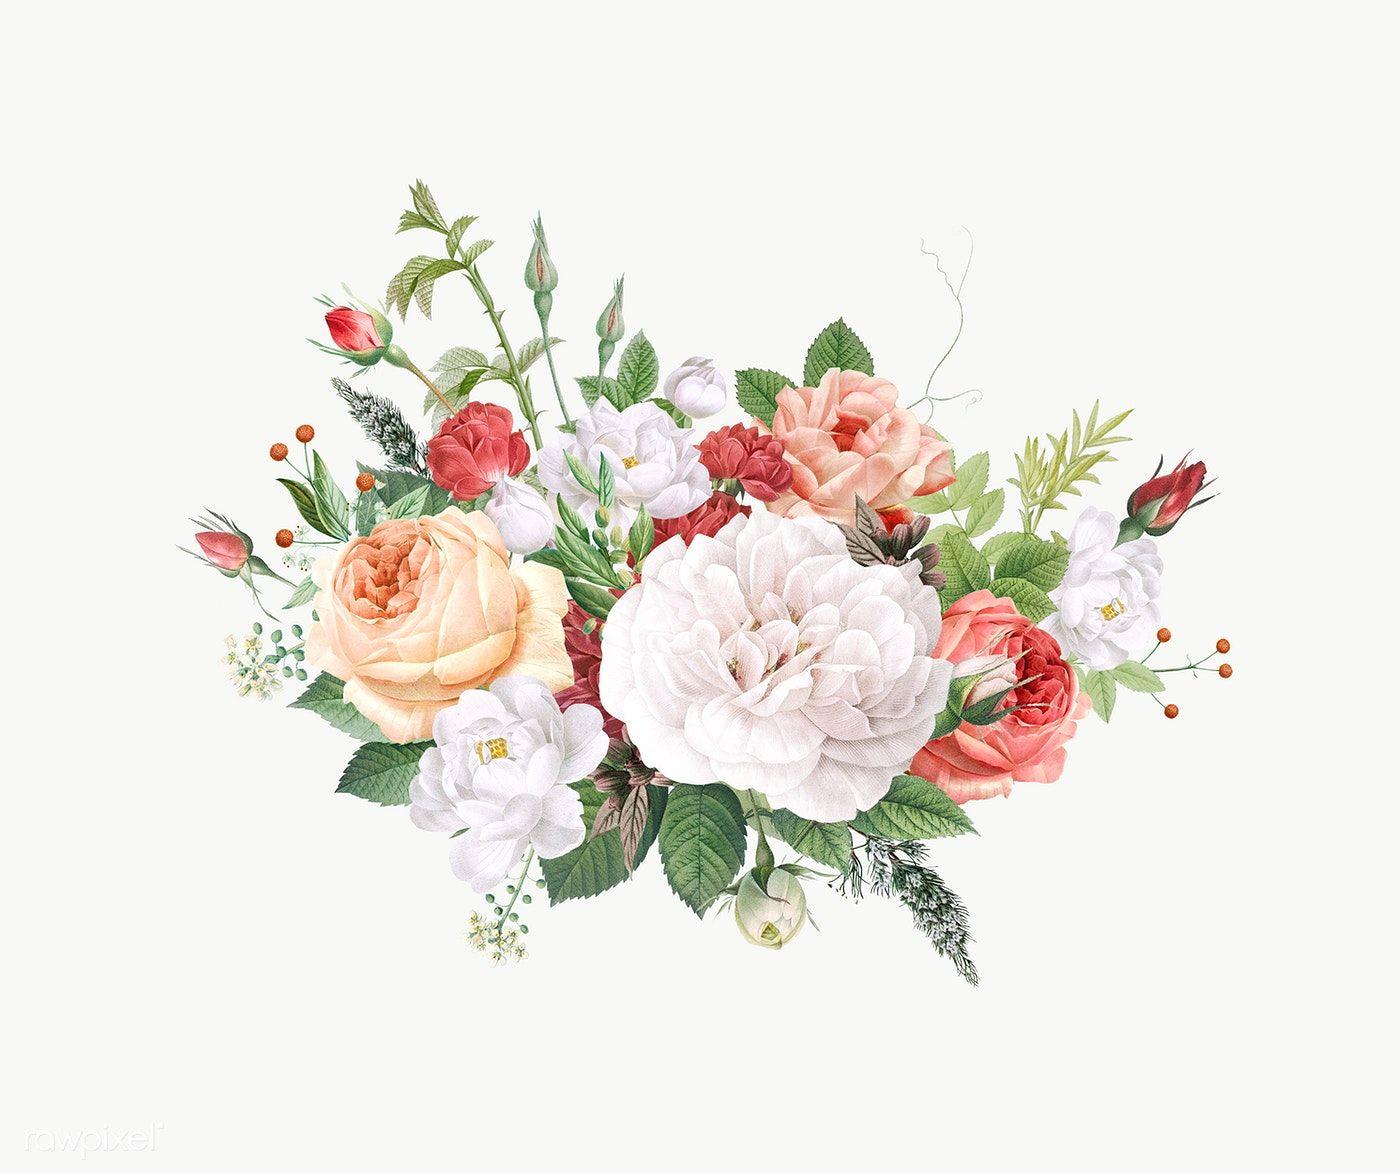 Vintage Colorful Flowers Design Transparent Png Premium Image By Rawpixel Com Por Piangpor Flower Design Vector Flower Illustration Floral Design